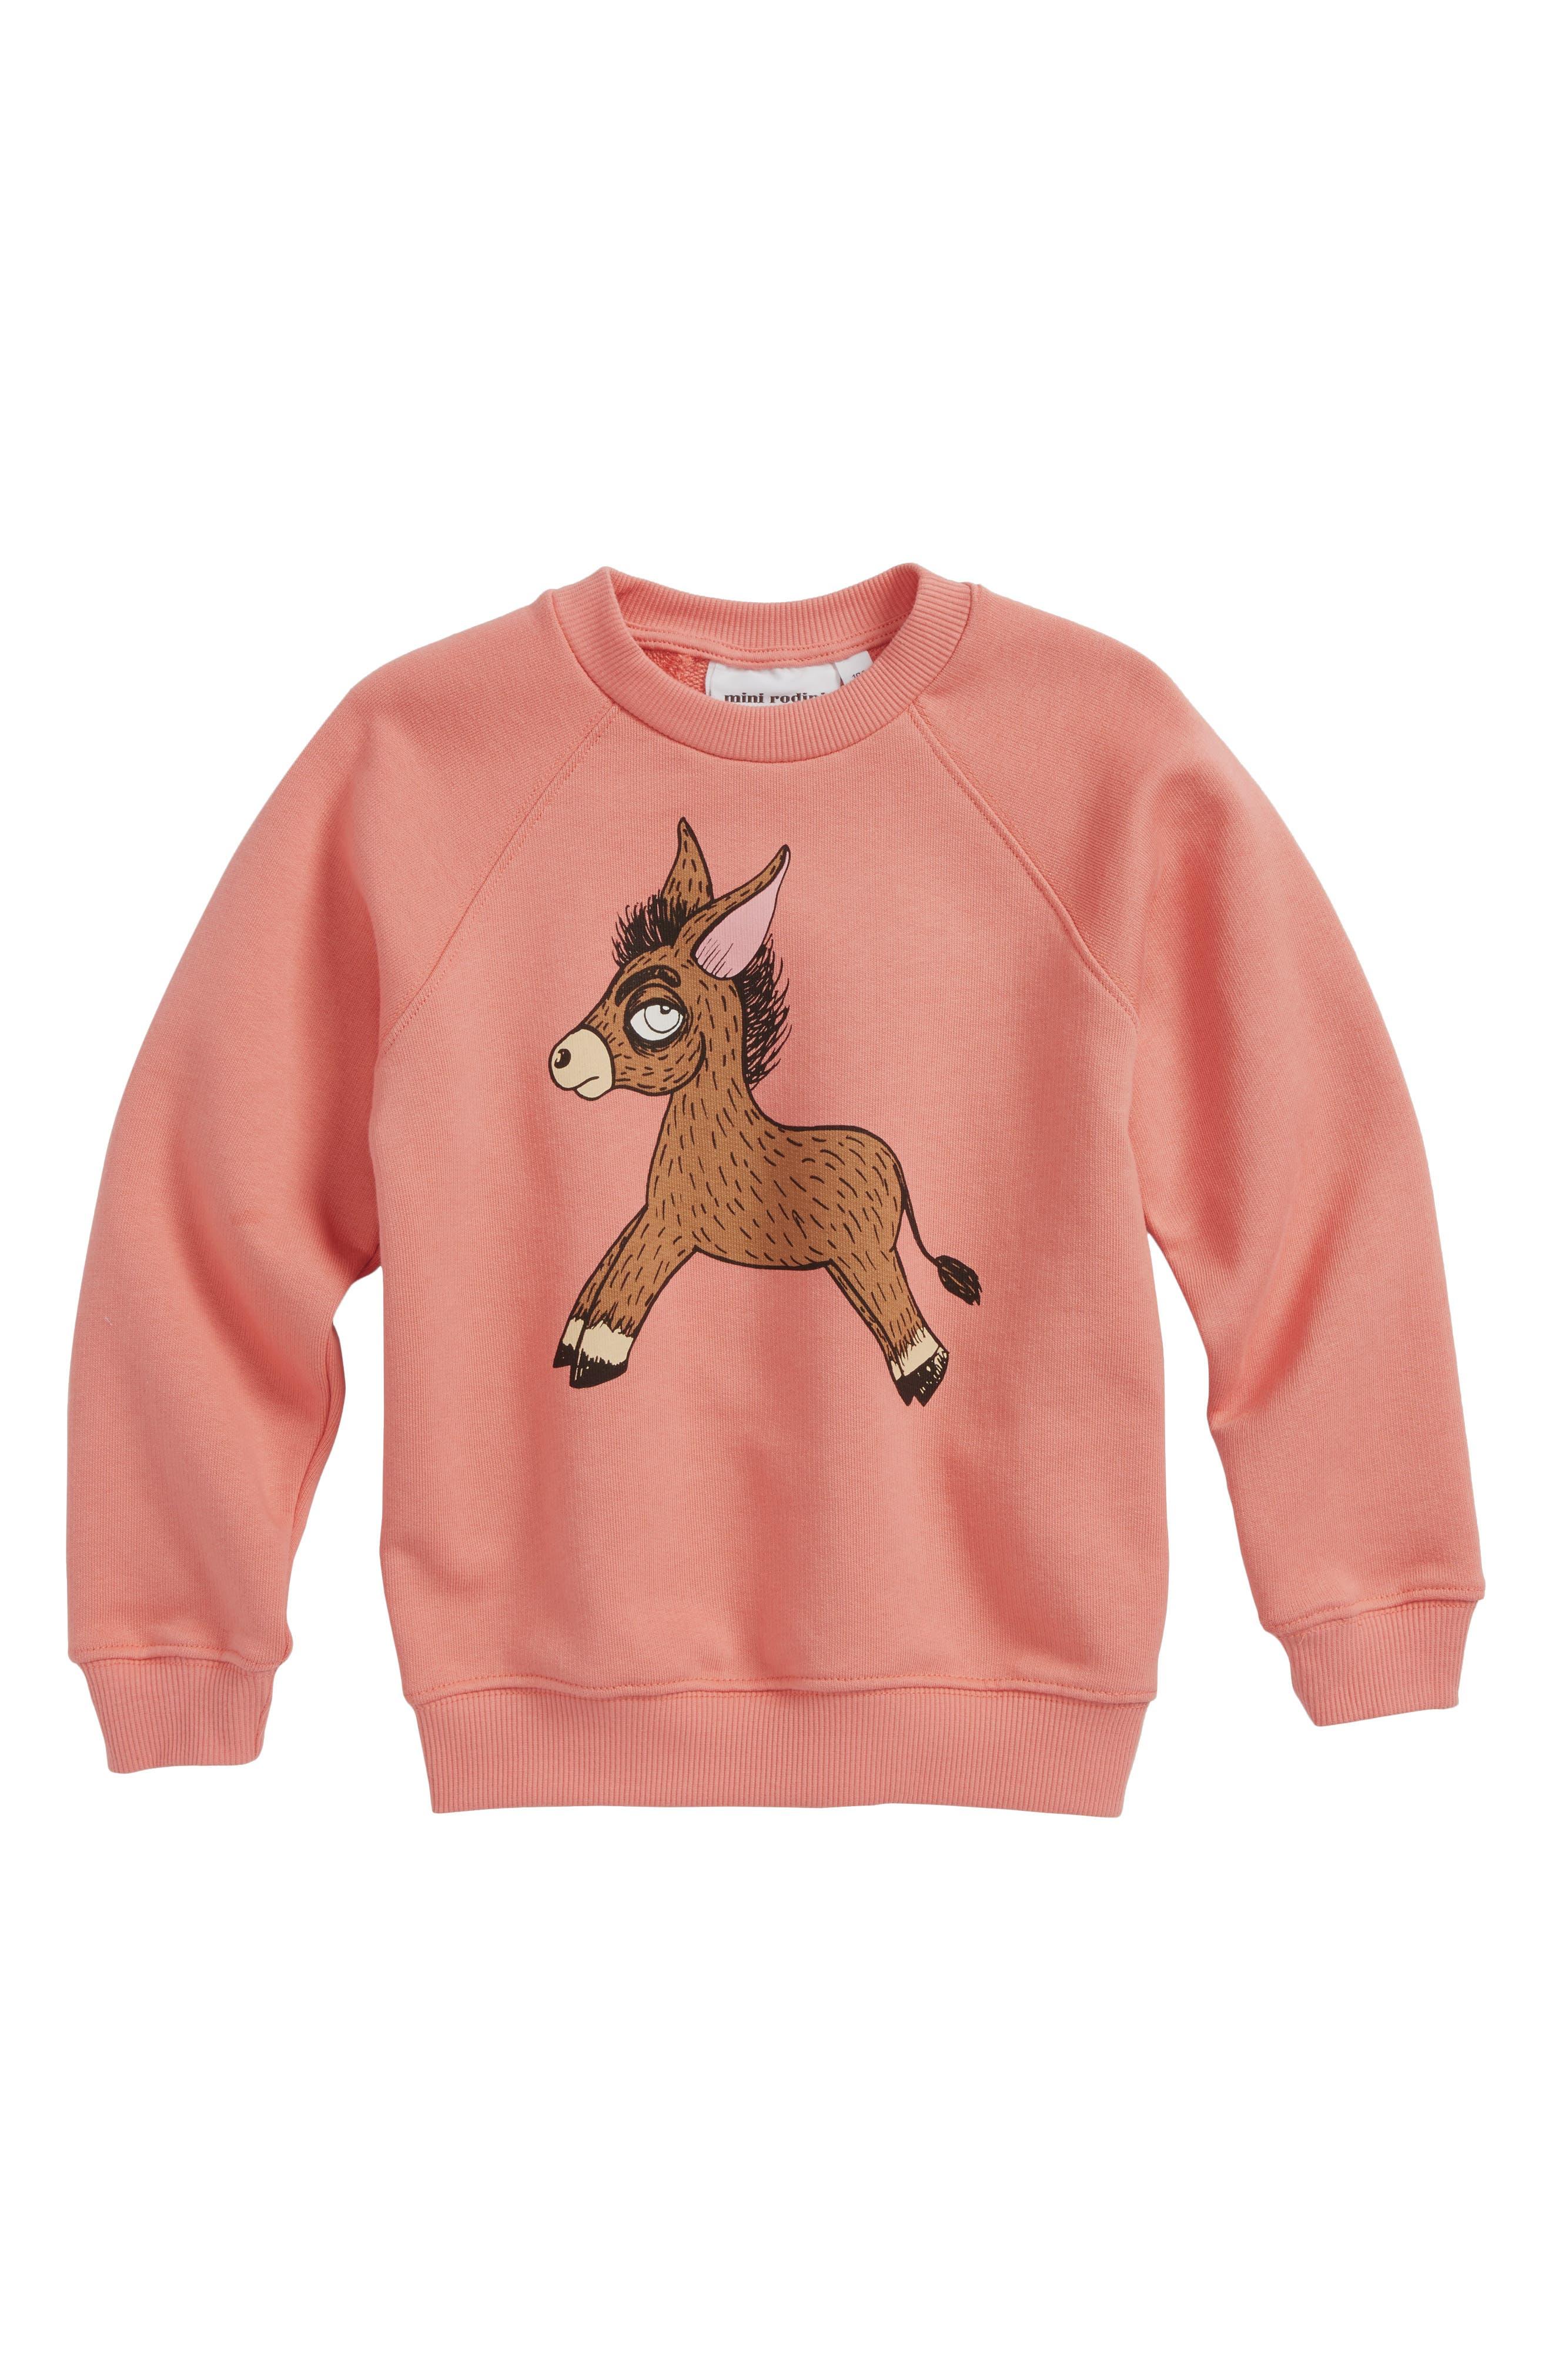 Donkey Organic Cotton Sweatshirt,                             Main thumbnail 1, color,